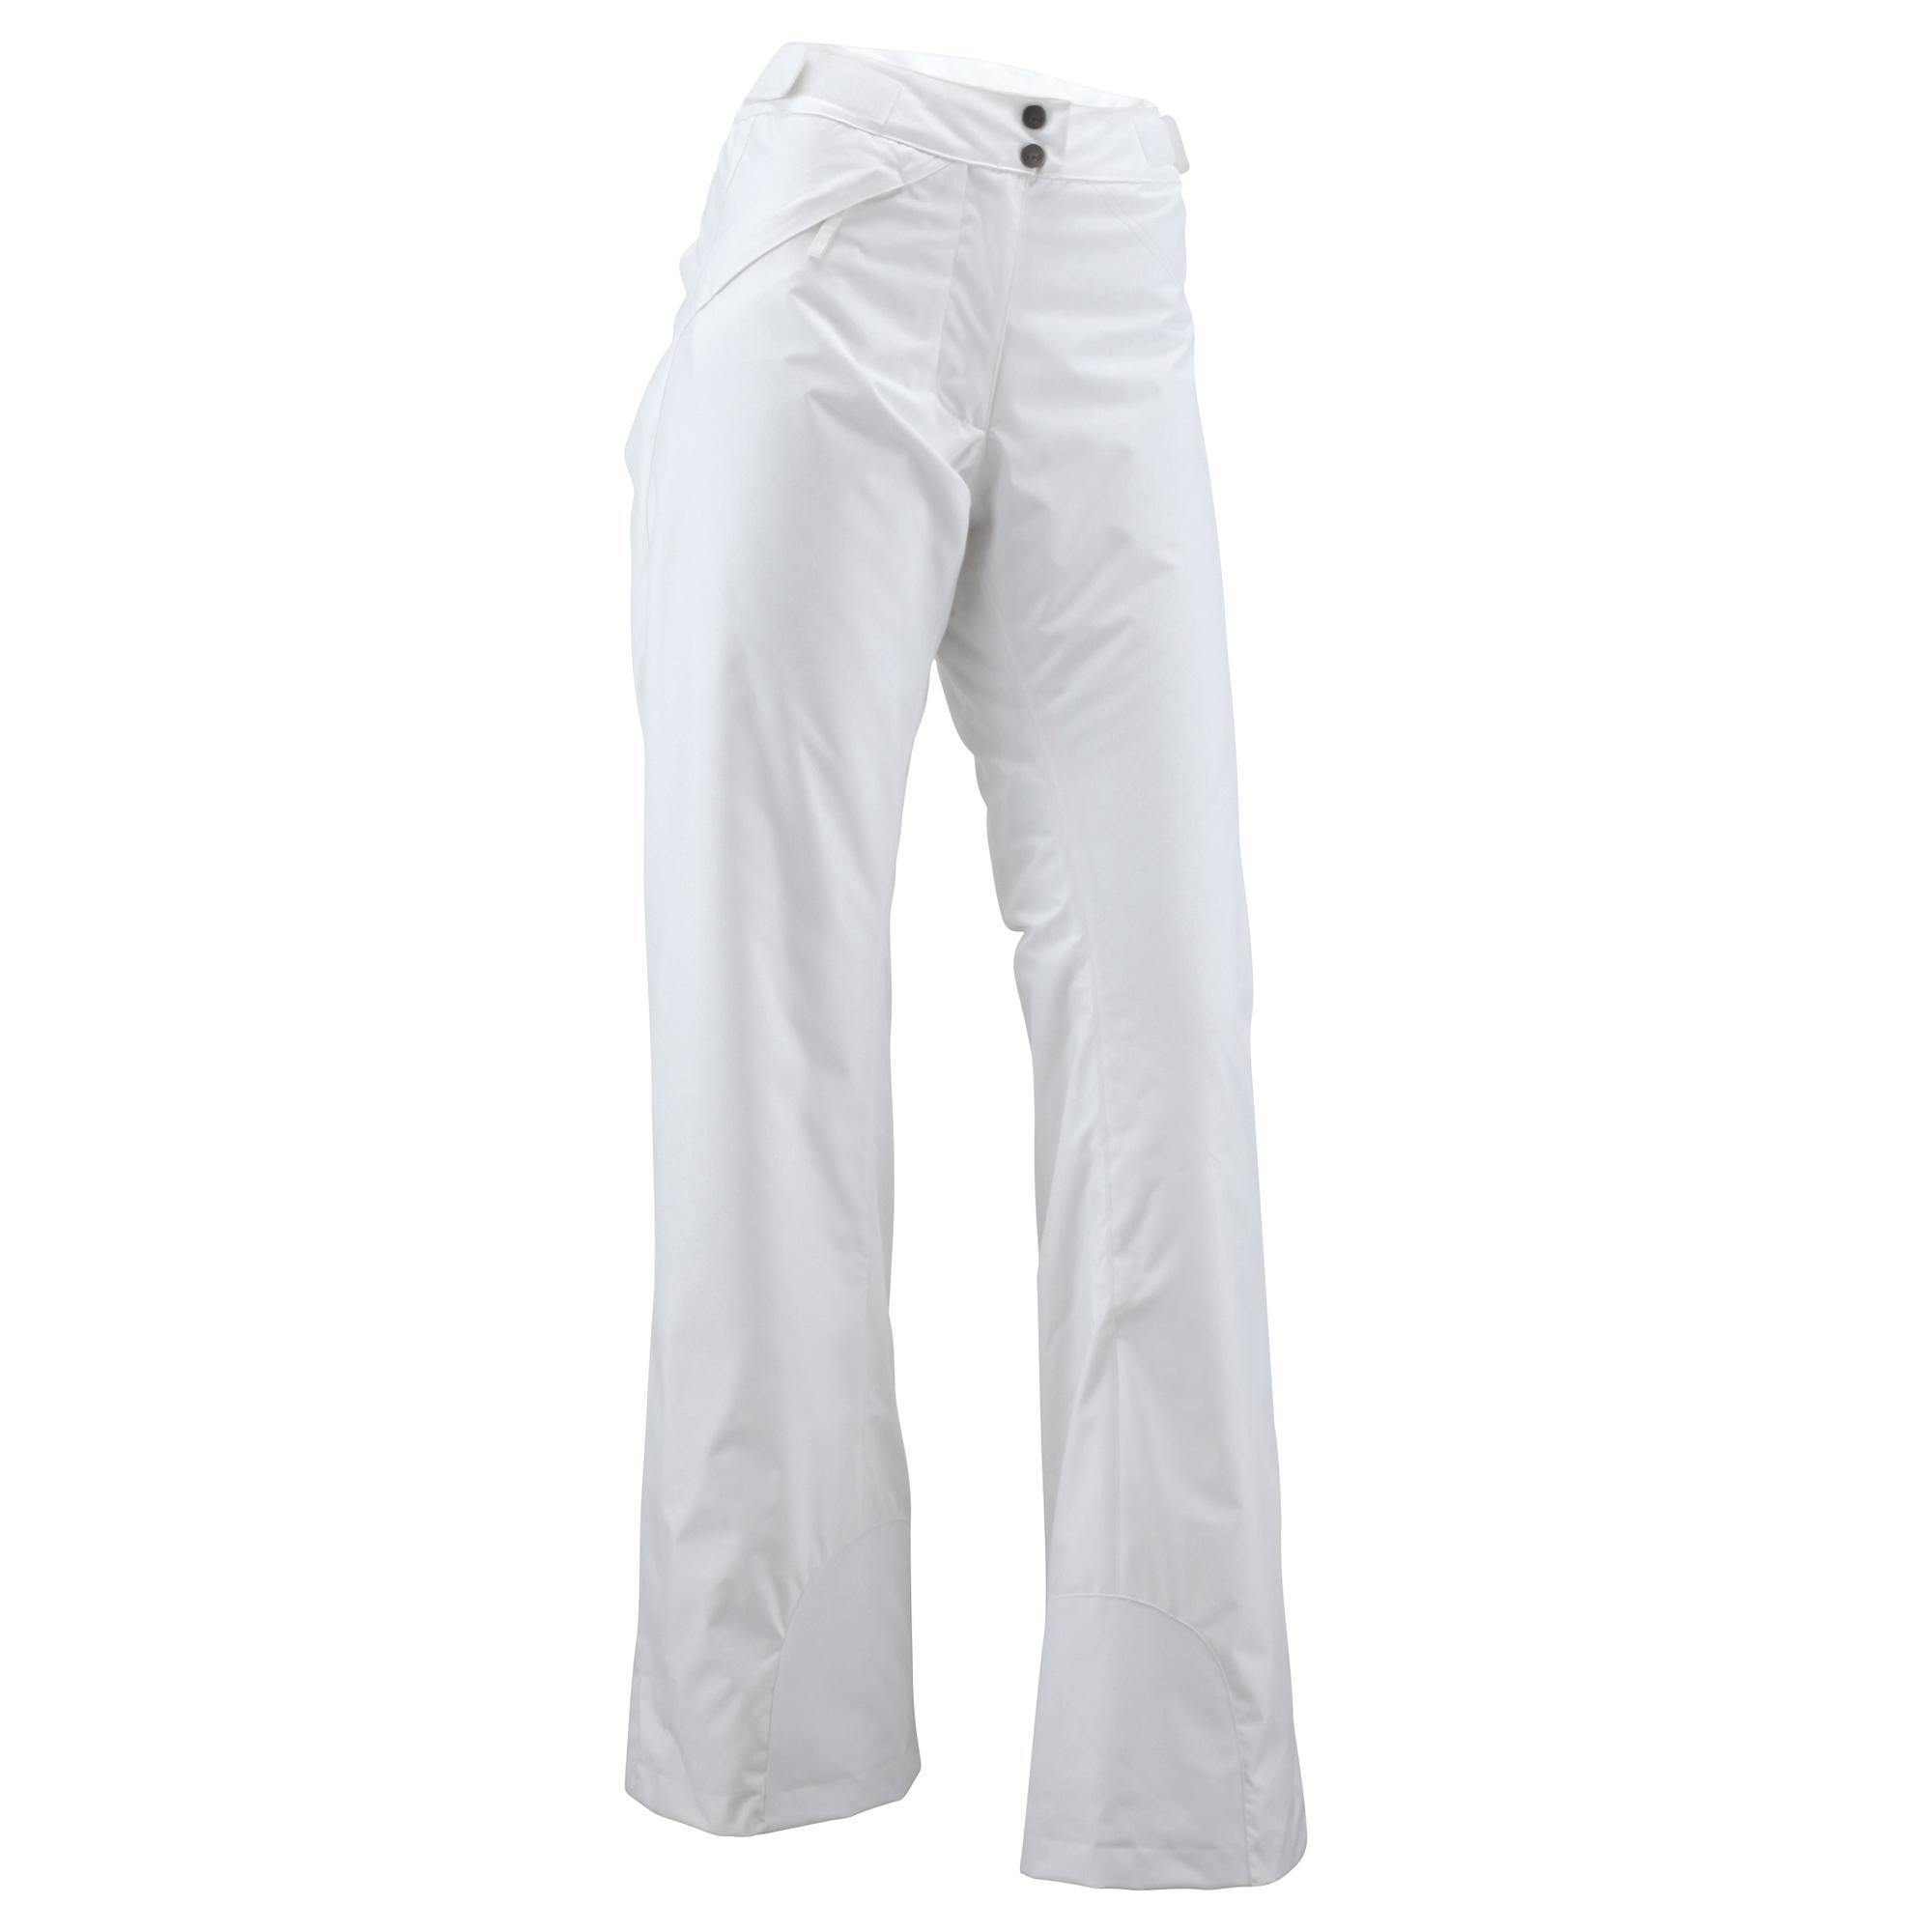 WEDZE FIRST HEAT WOMEN S SKI PANTS - WHITE  99e05795d